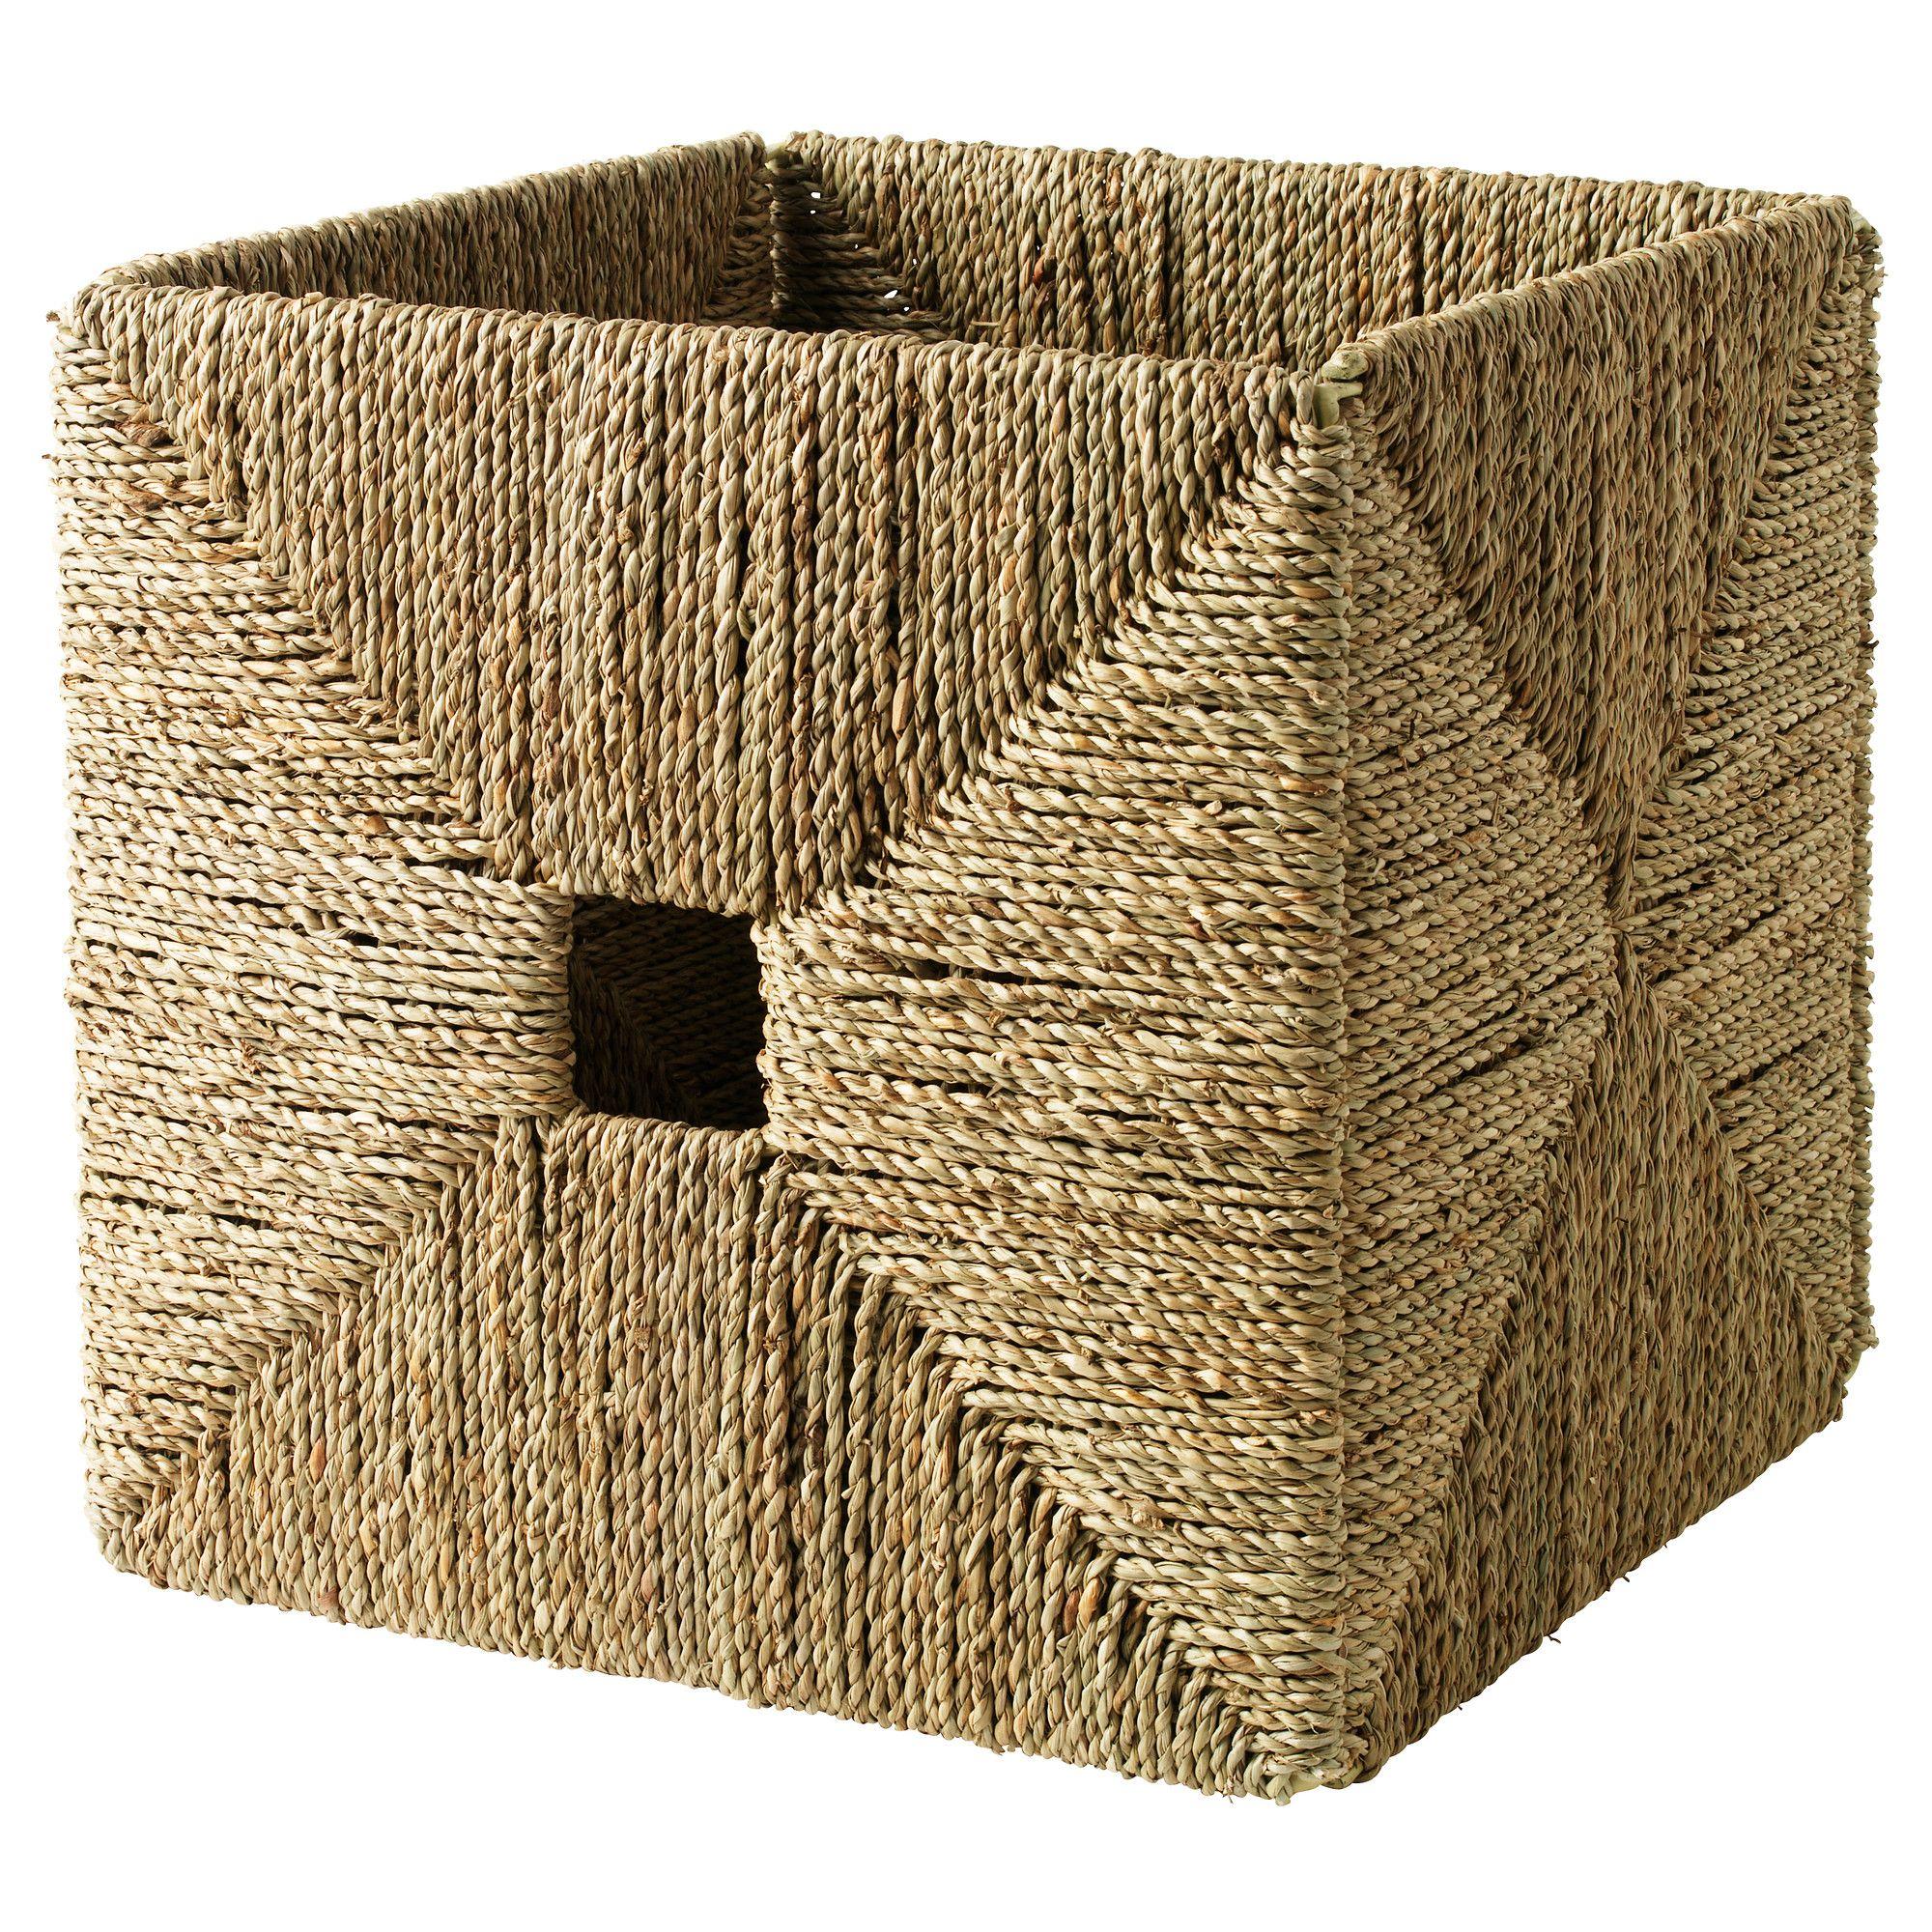 Knipsa Basket Seagrass Ikea Ikea Basket Ikea Storage Boxes Ikea Storage